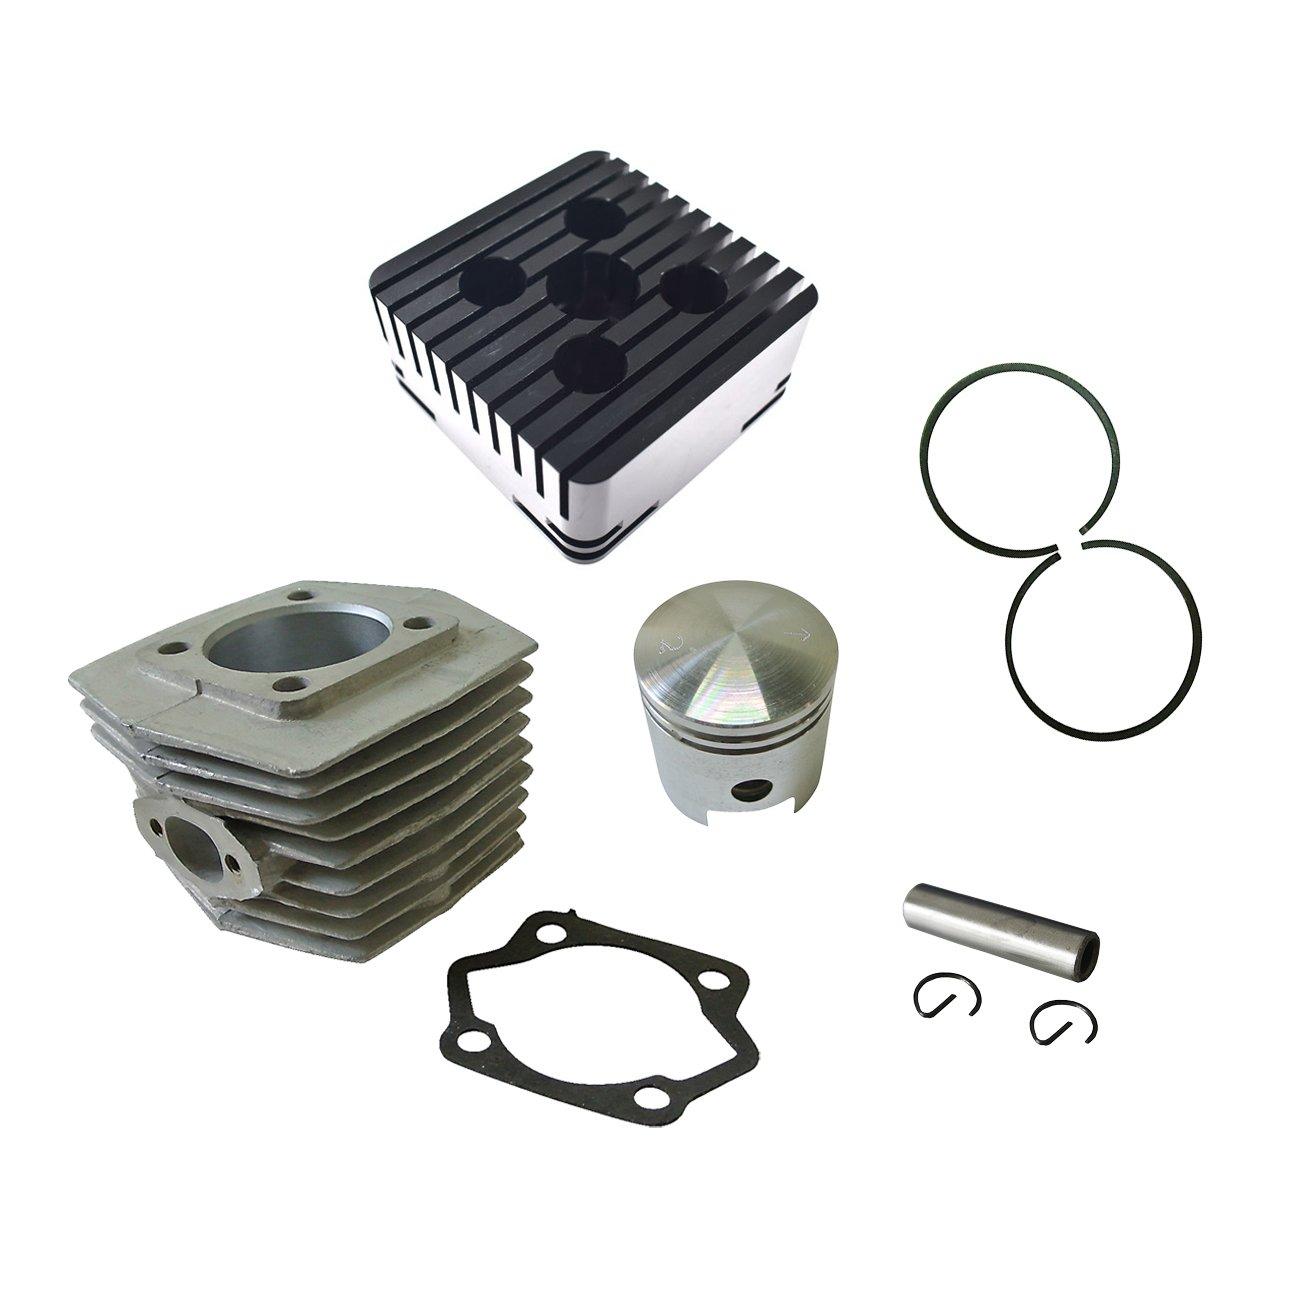 Cylinder Head/&Cylinder/&Piston Fits 66cc 80cc 2 Stroke Engine Motorized Bicycle